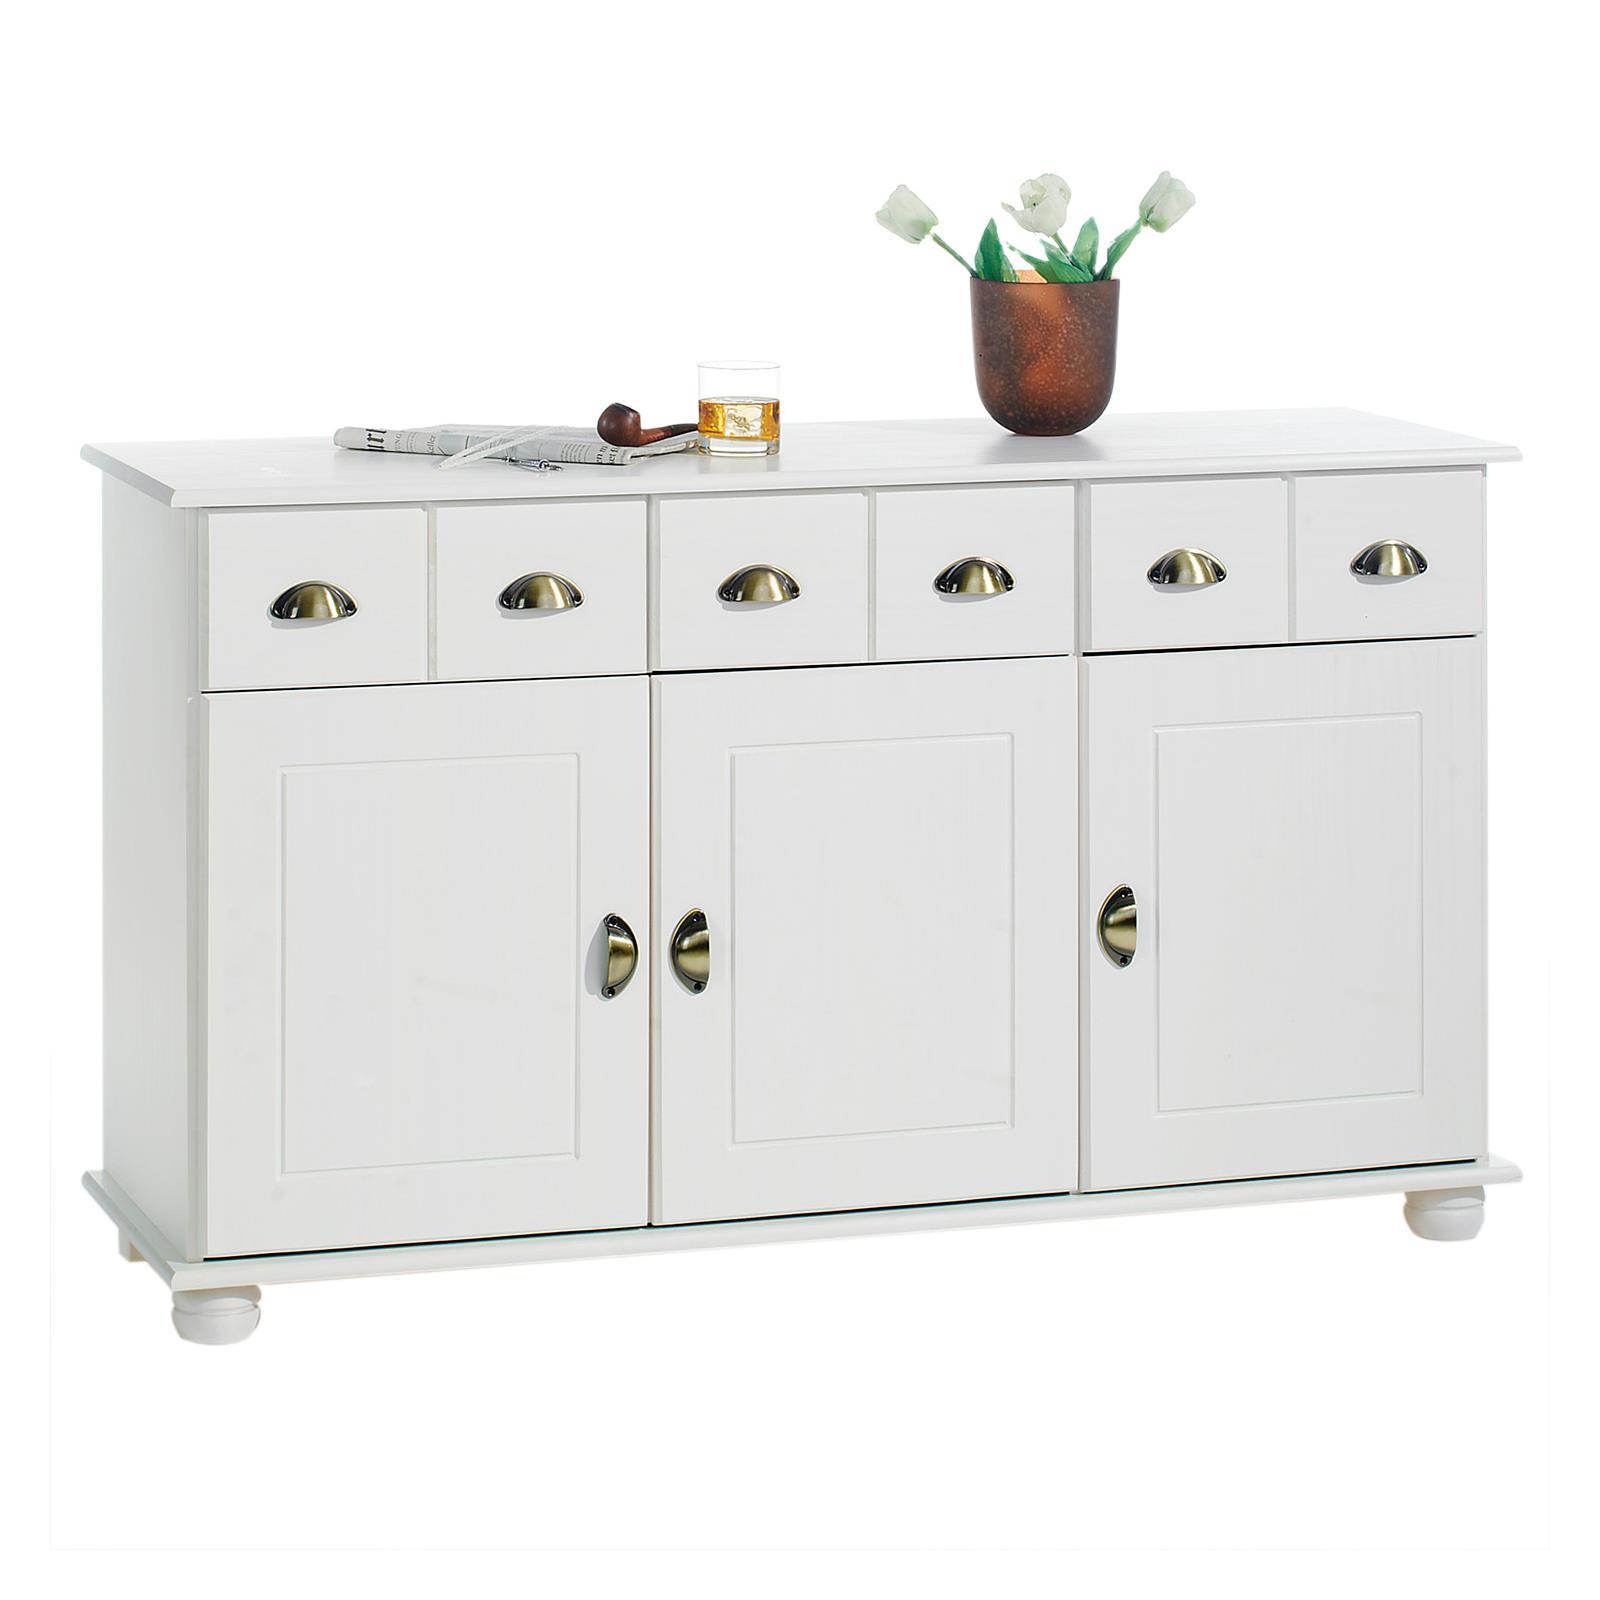 Buffet en pin colmar 3 tiroirs 3 portes lasur blanc - Buffet de cuisine en pin ...